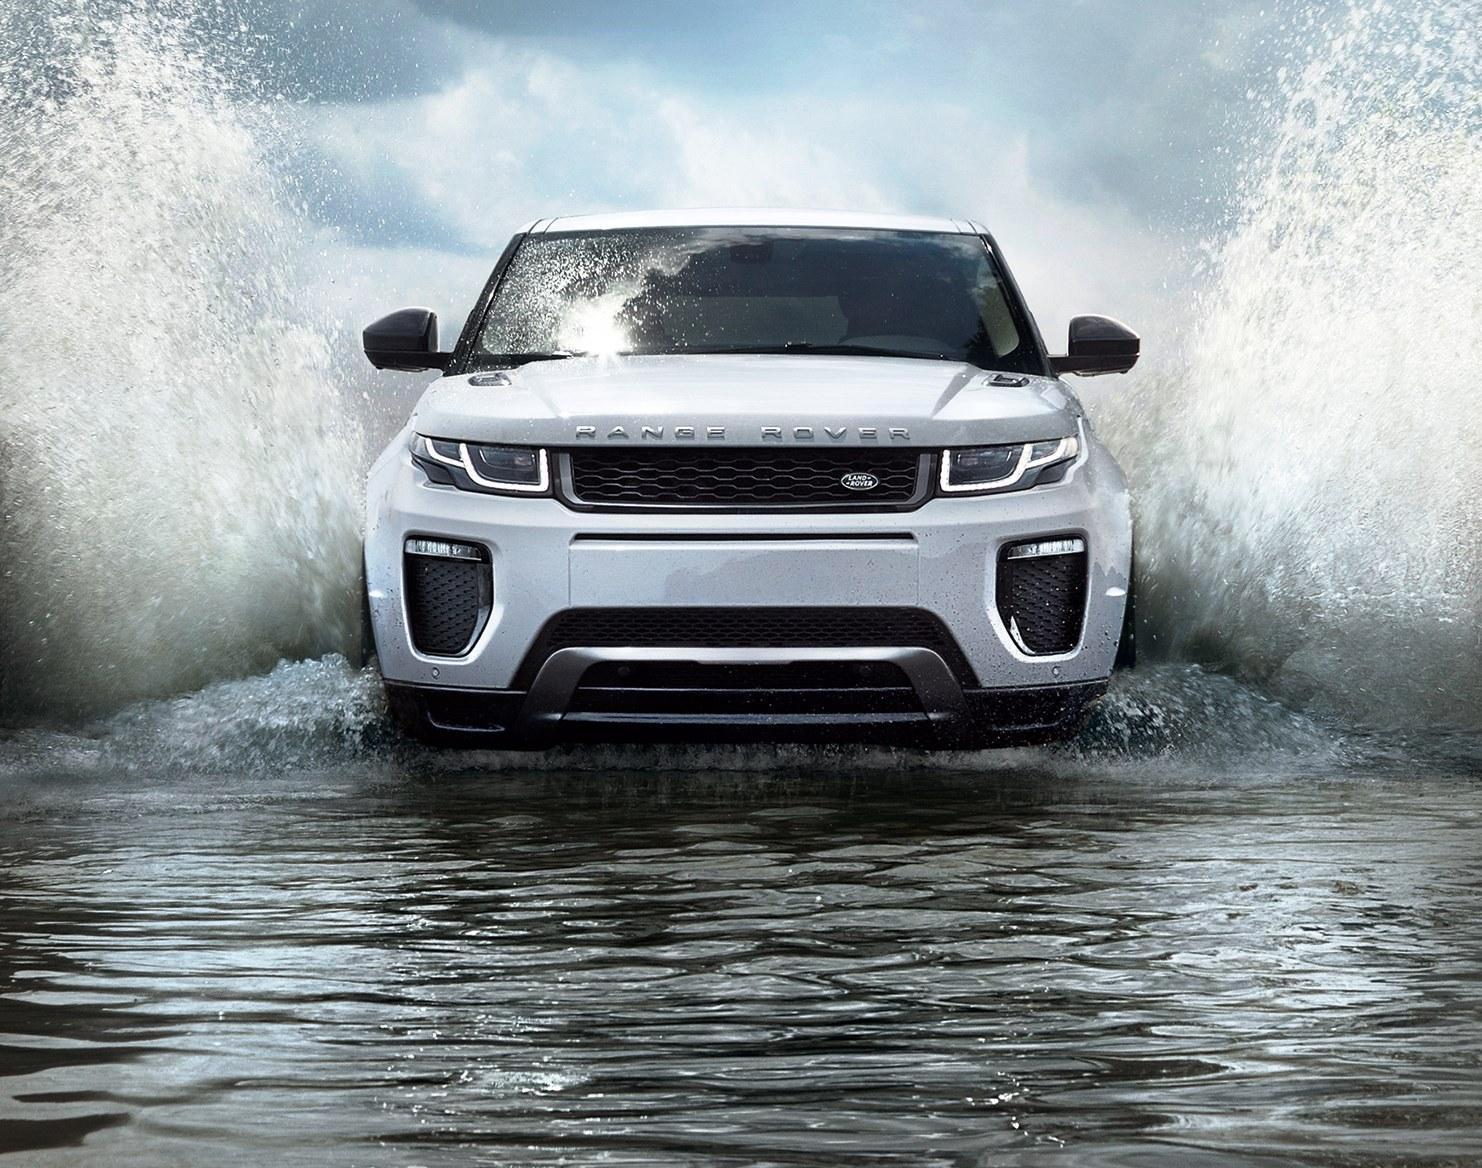 2016 Range Rover Evoque Facelift Wiring Diagrams Jaguar